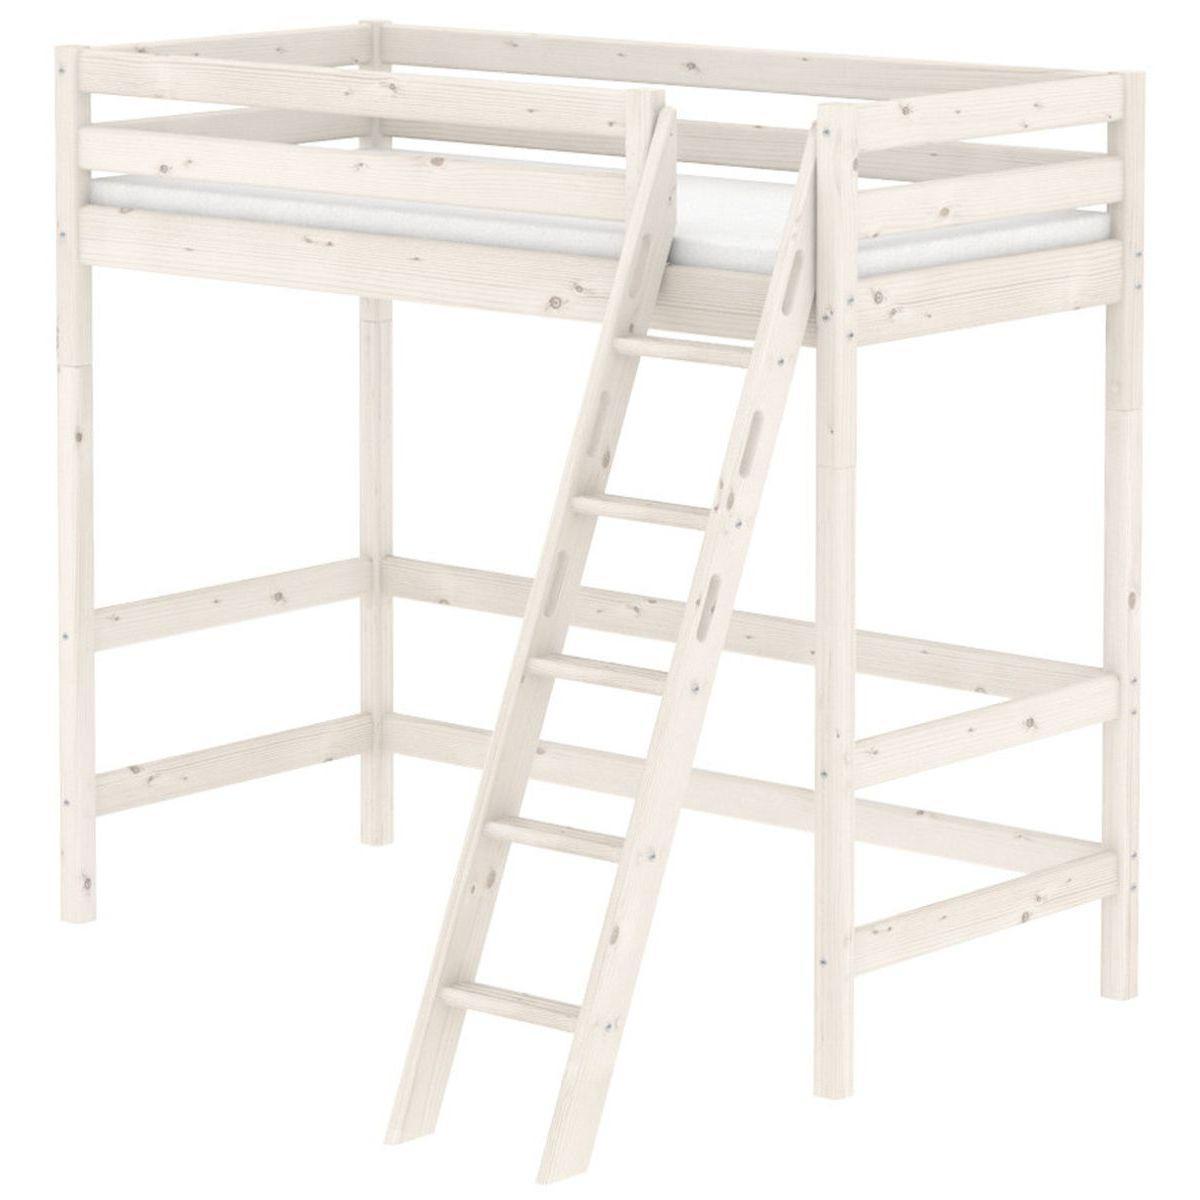 Cama alta 90x190 CLASSIC Flexa escalera inclinada blanco cal